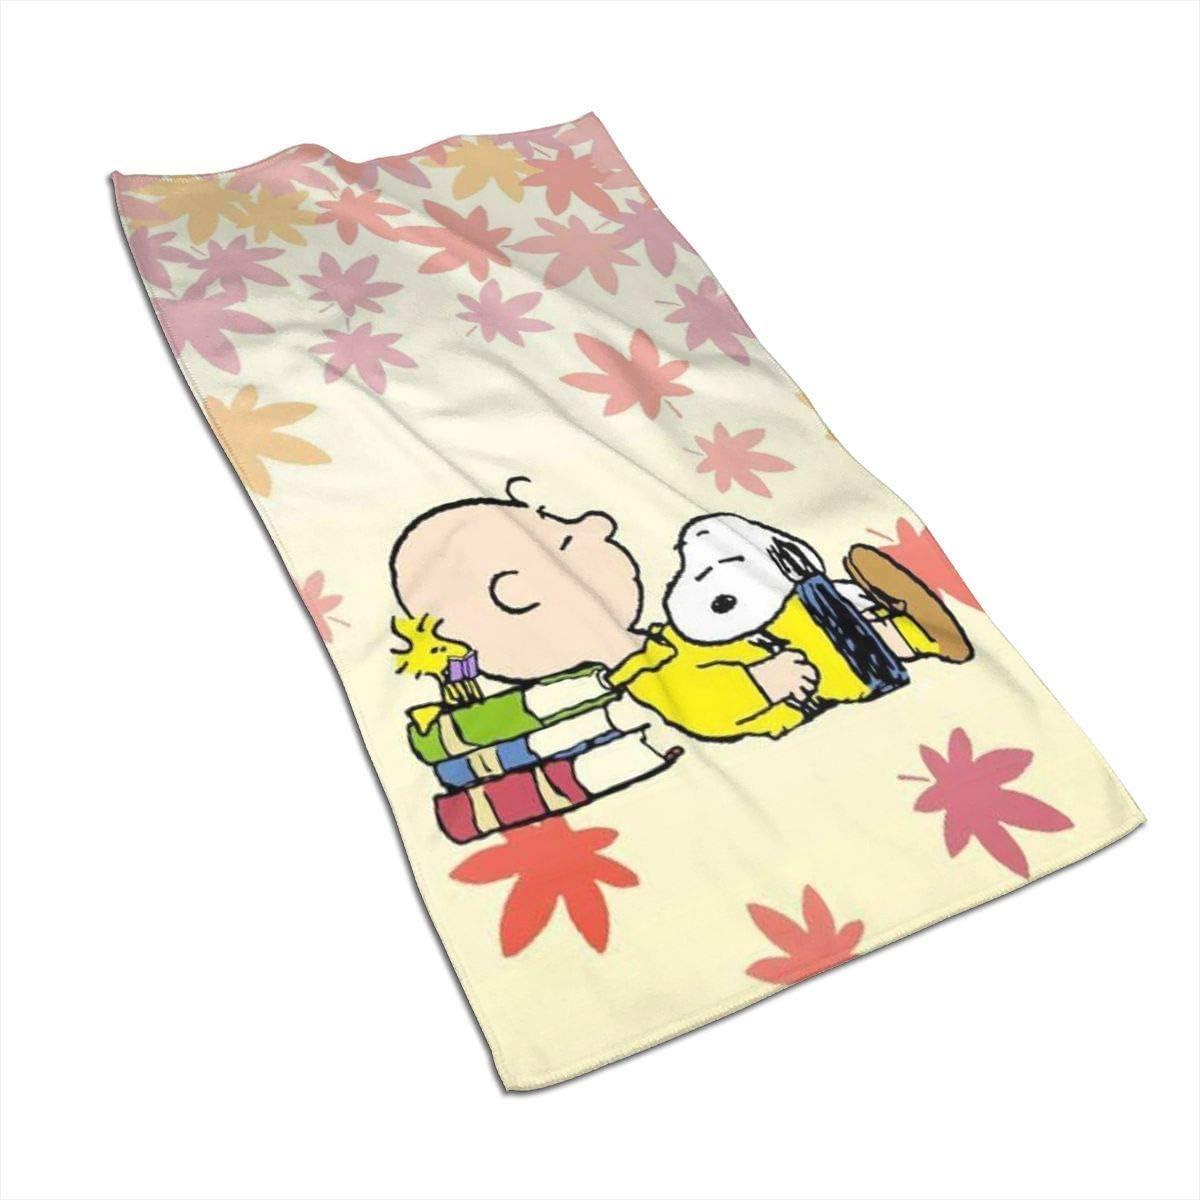 27,5 x 17,5 Pollici Mj-Shop Asciugamano//Asciugamano da Bagno//Asciugamano da Spiaggia ad Asciugatura Rapida Super Assorbente Morbido Snoopys